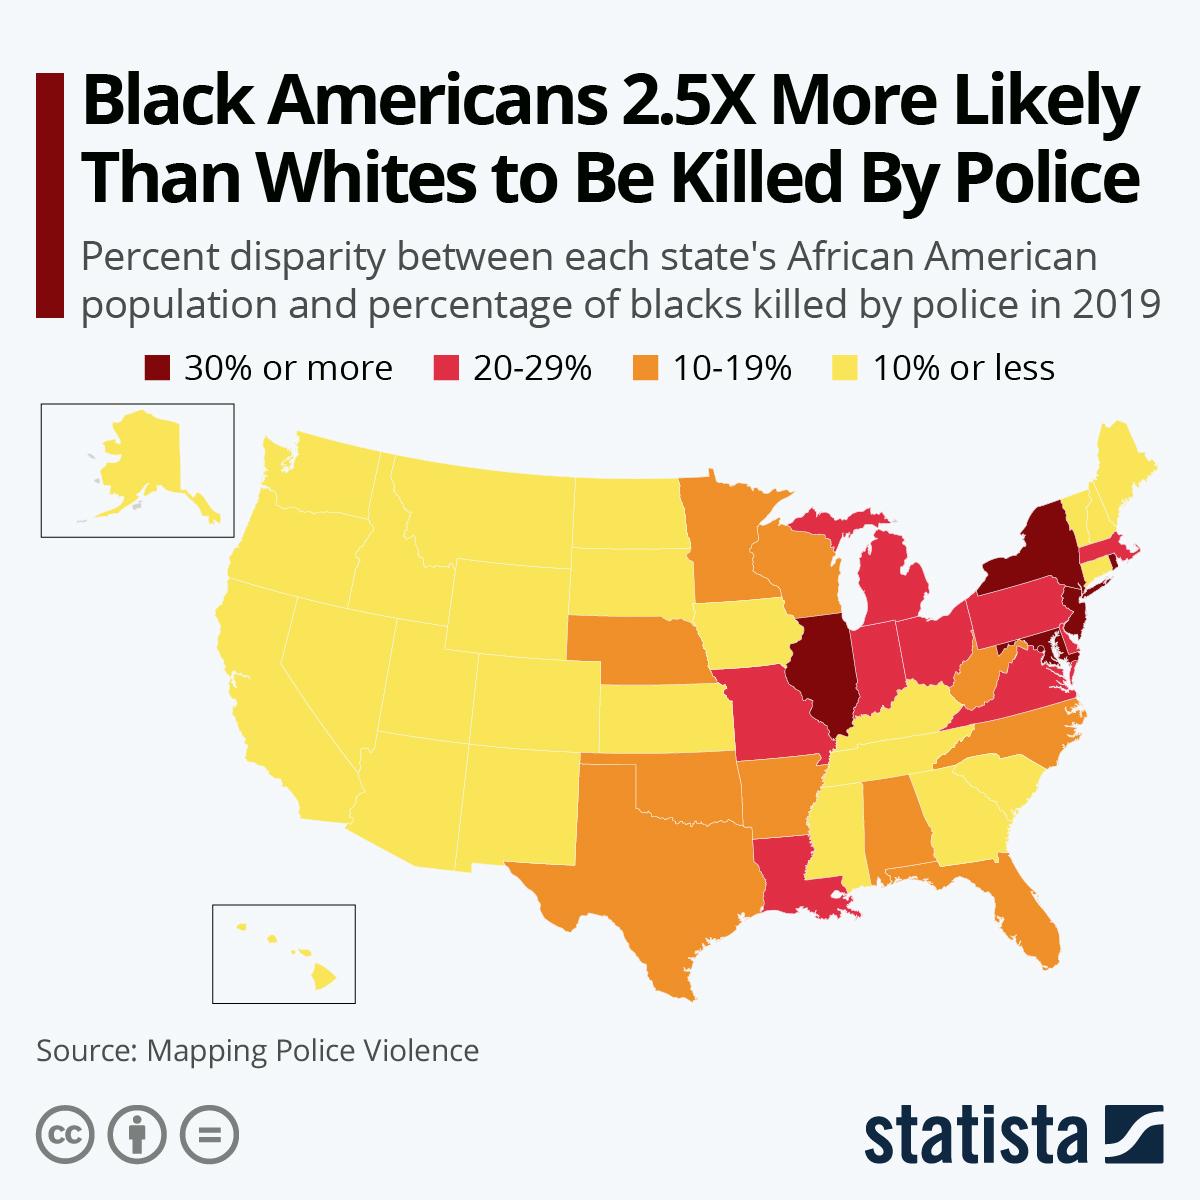 www.statista.com